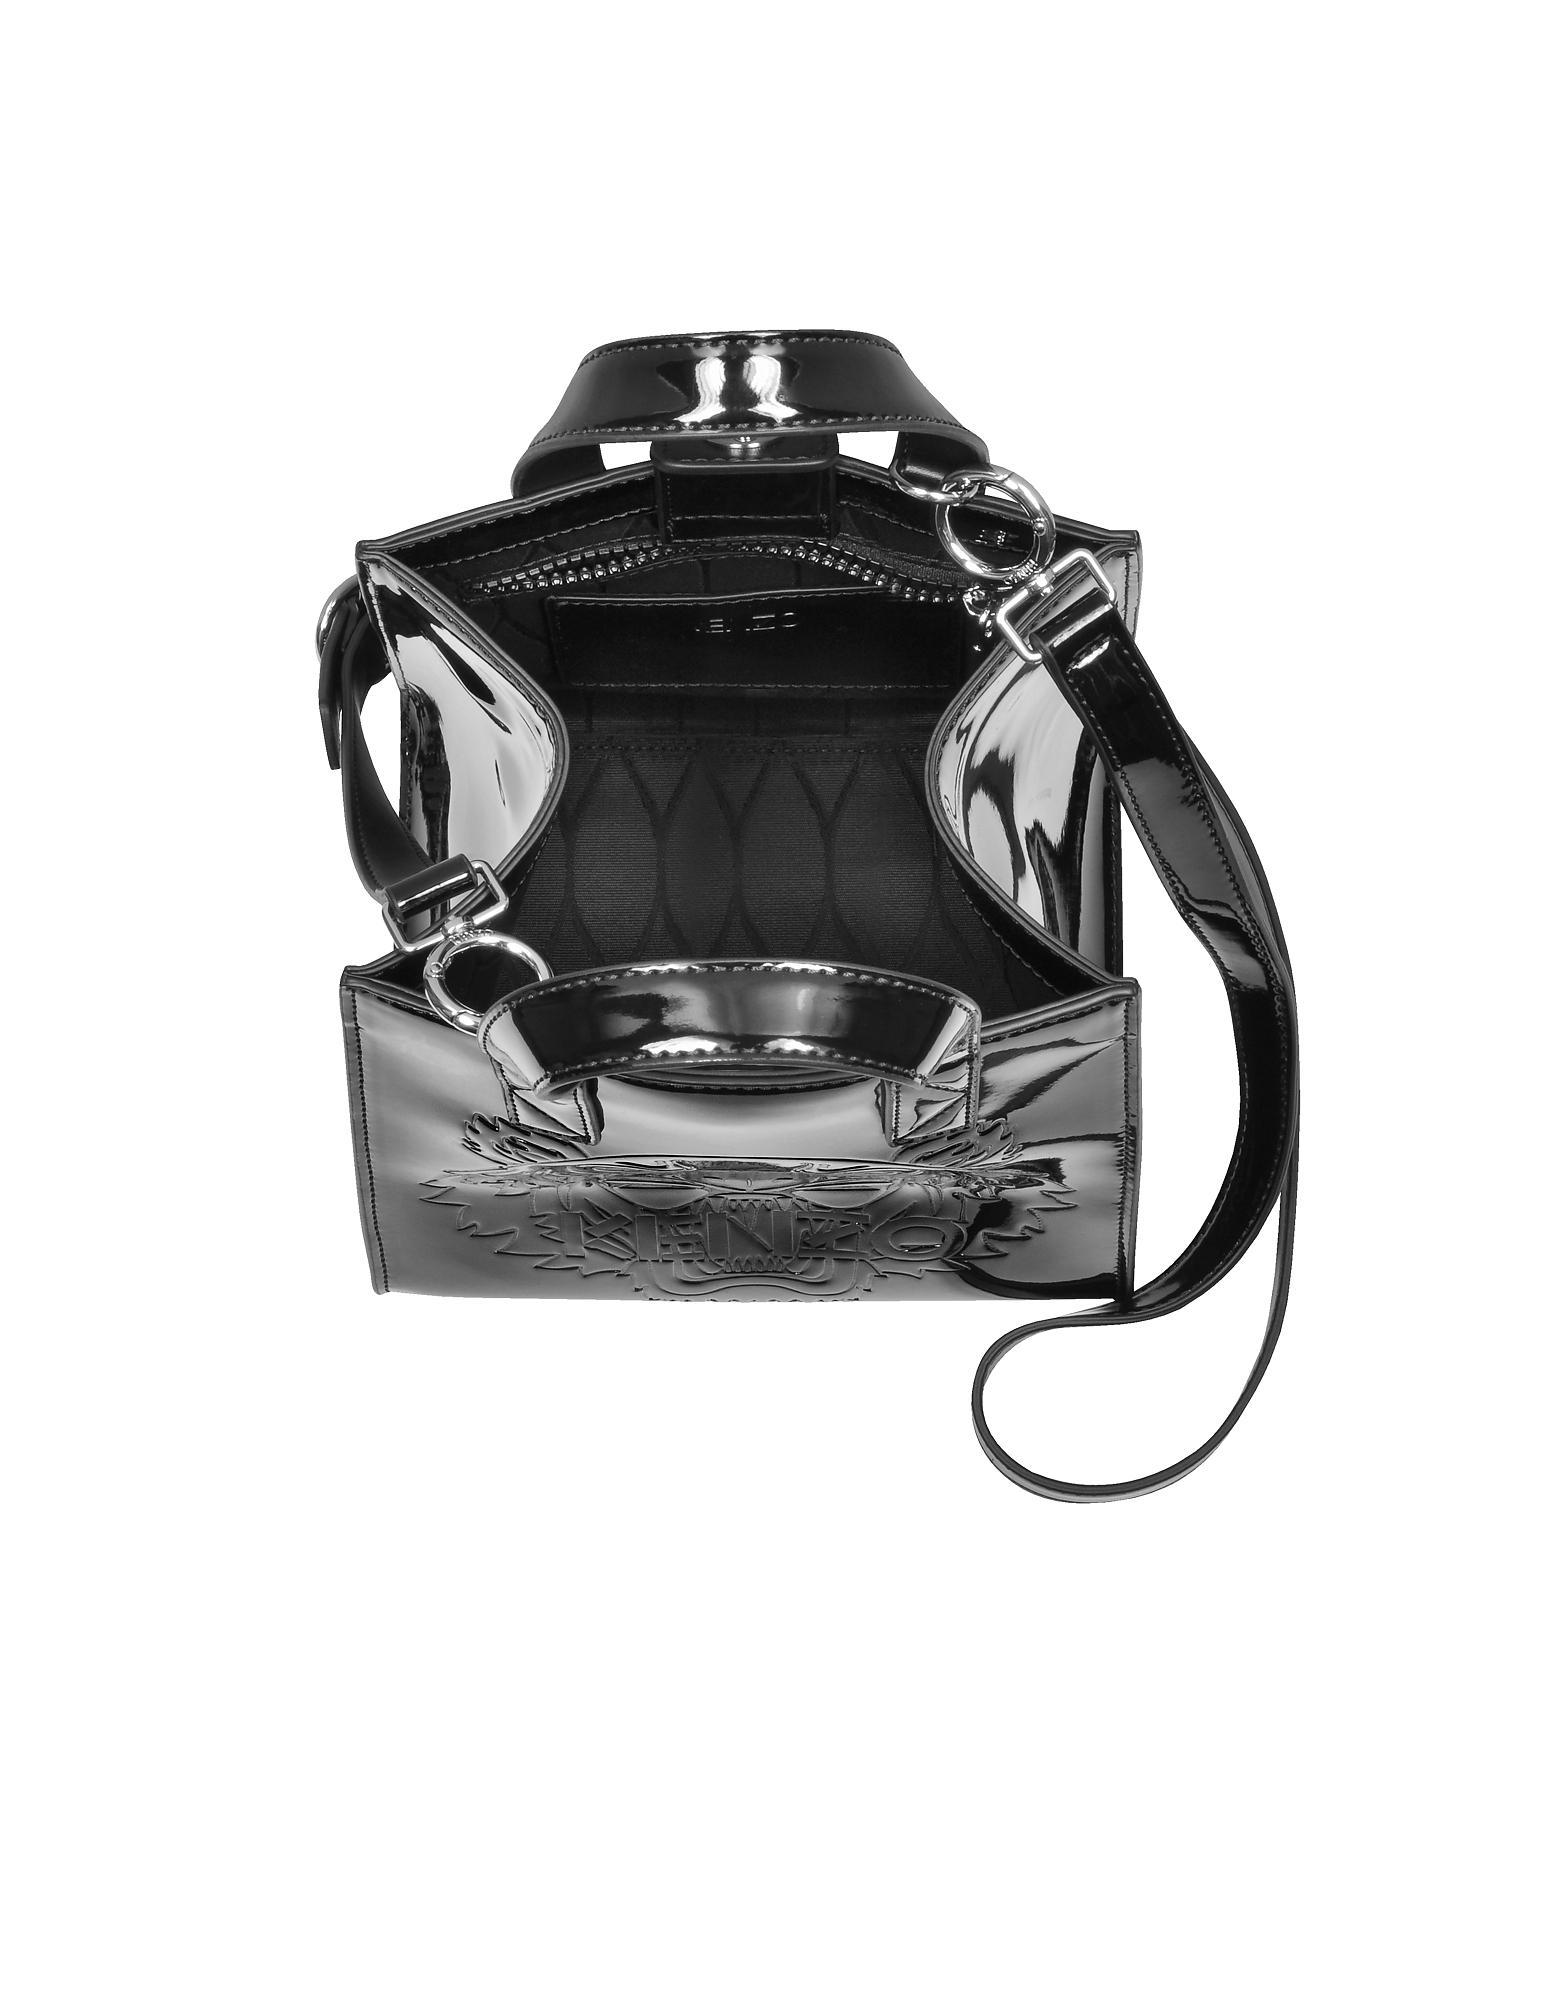 638330dcc8f3 Lyst - KENZO Black Patent Mini Tiger Tote Bag in Black